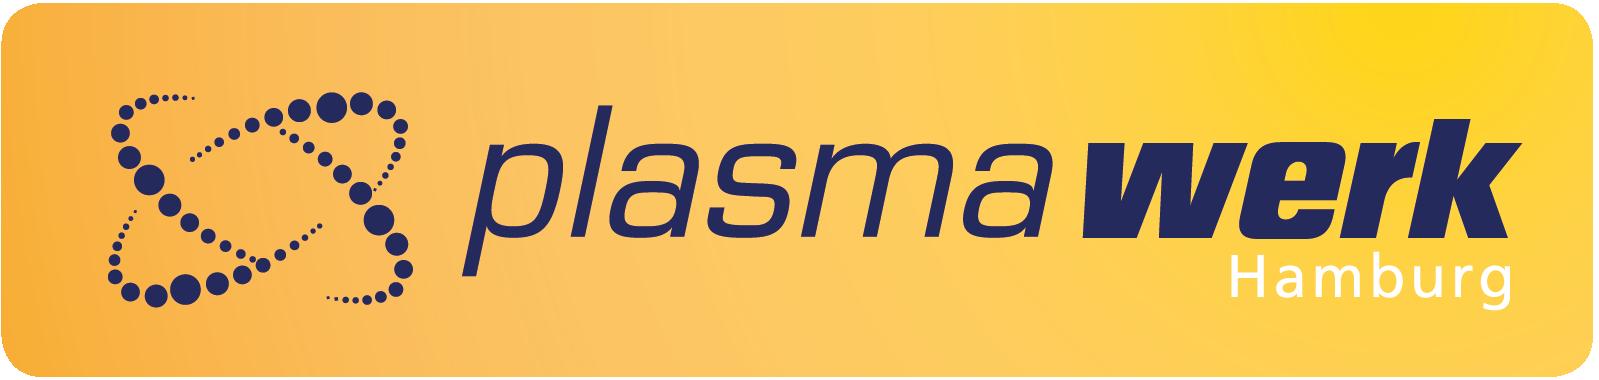 Plasmawerk GmbH